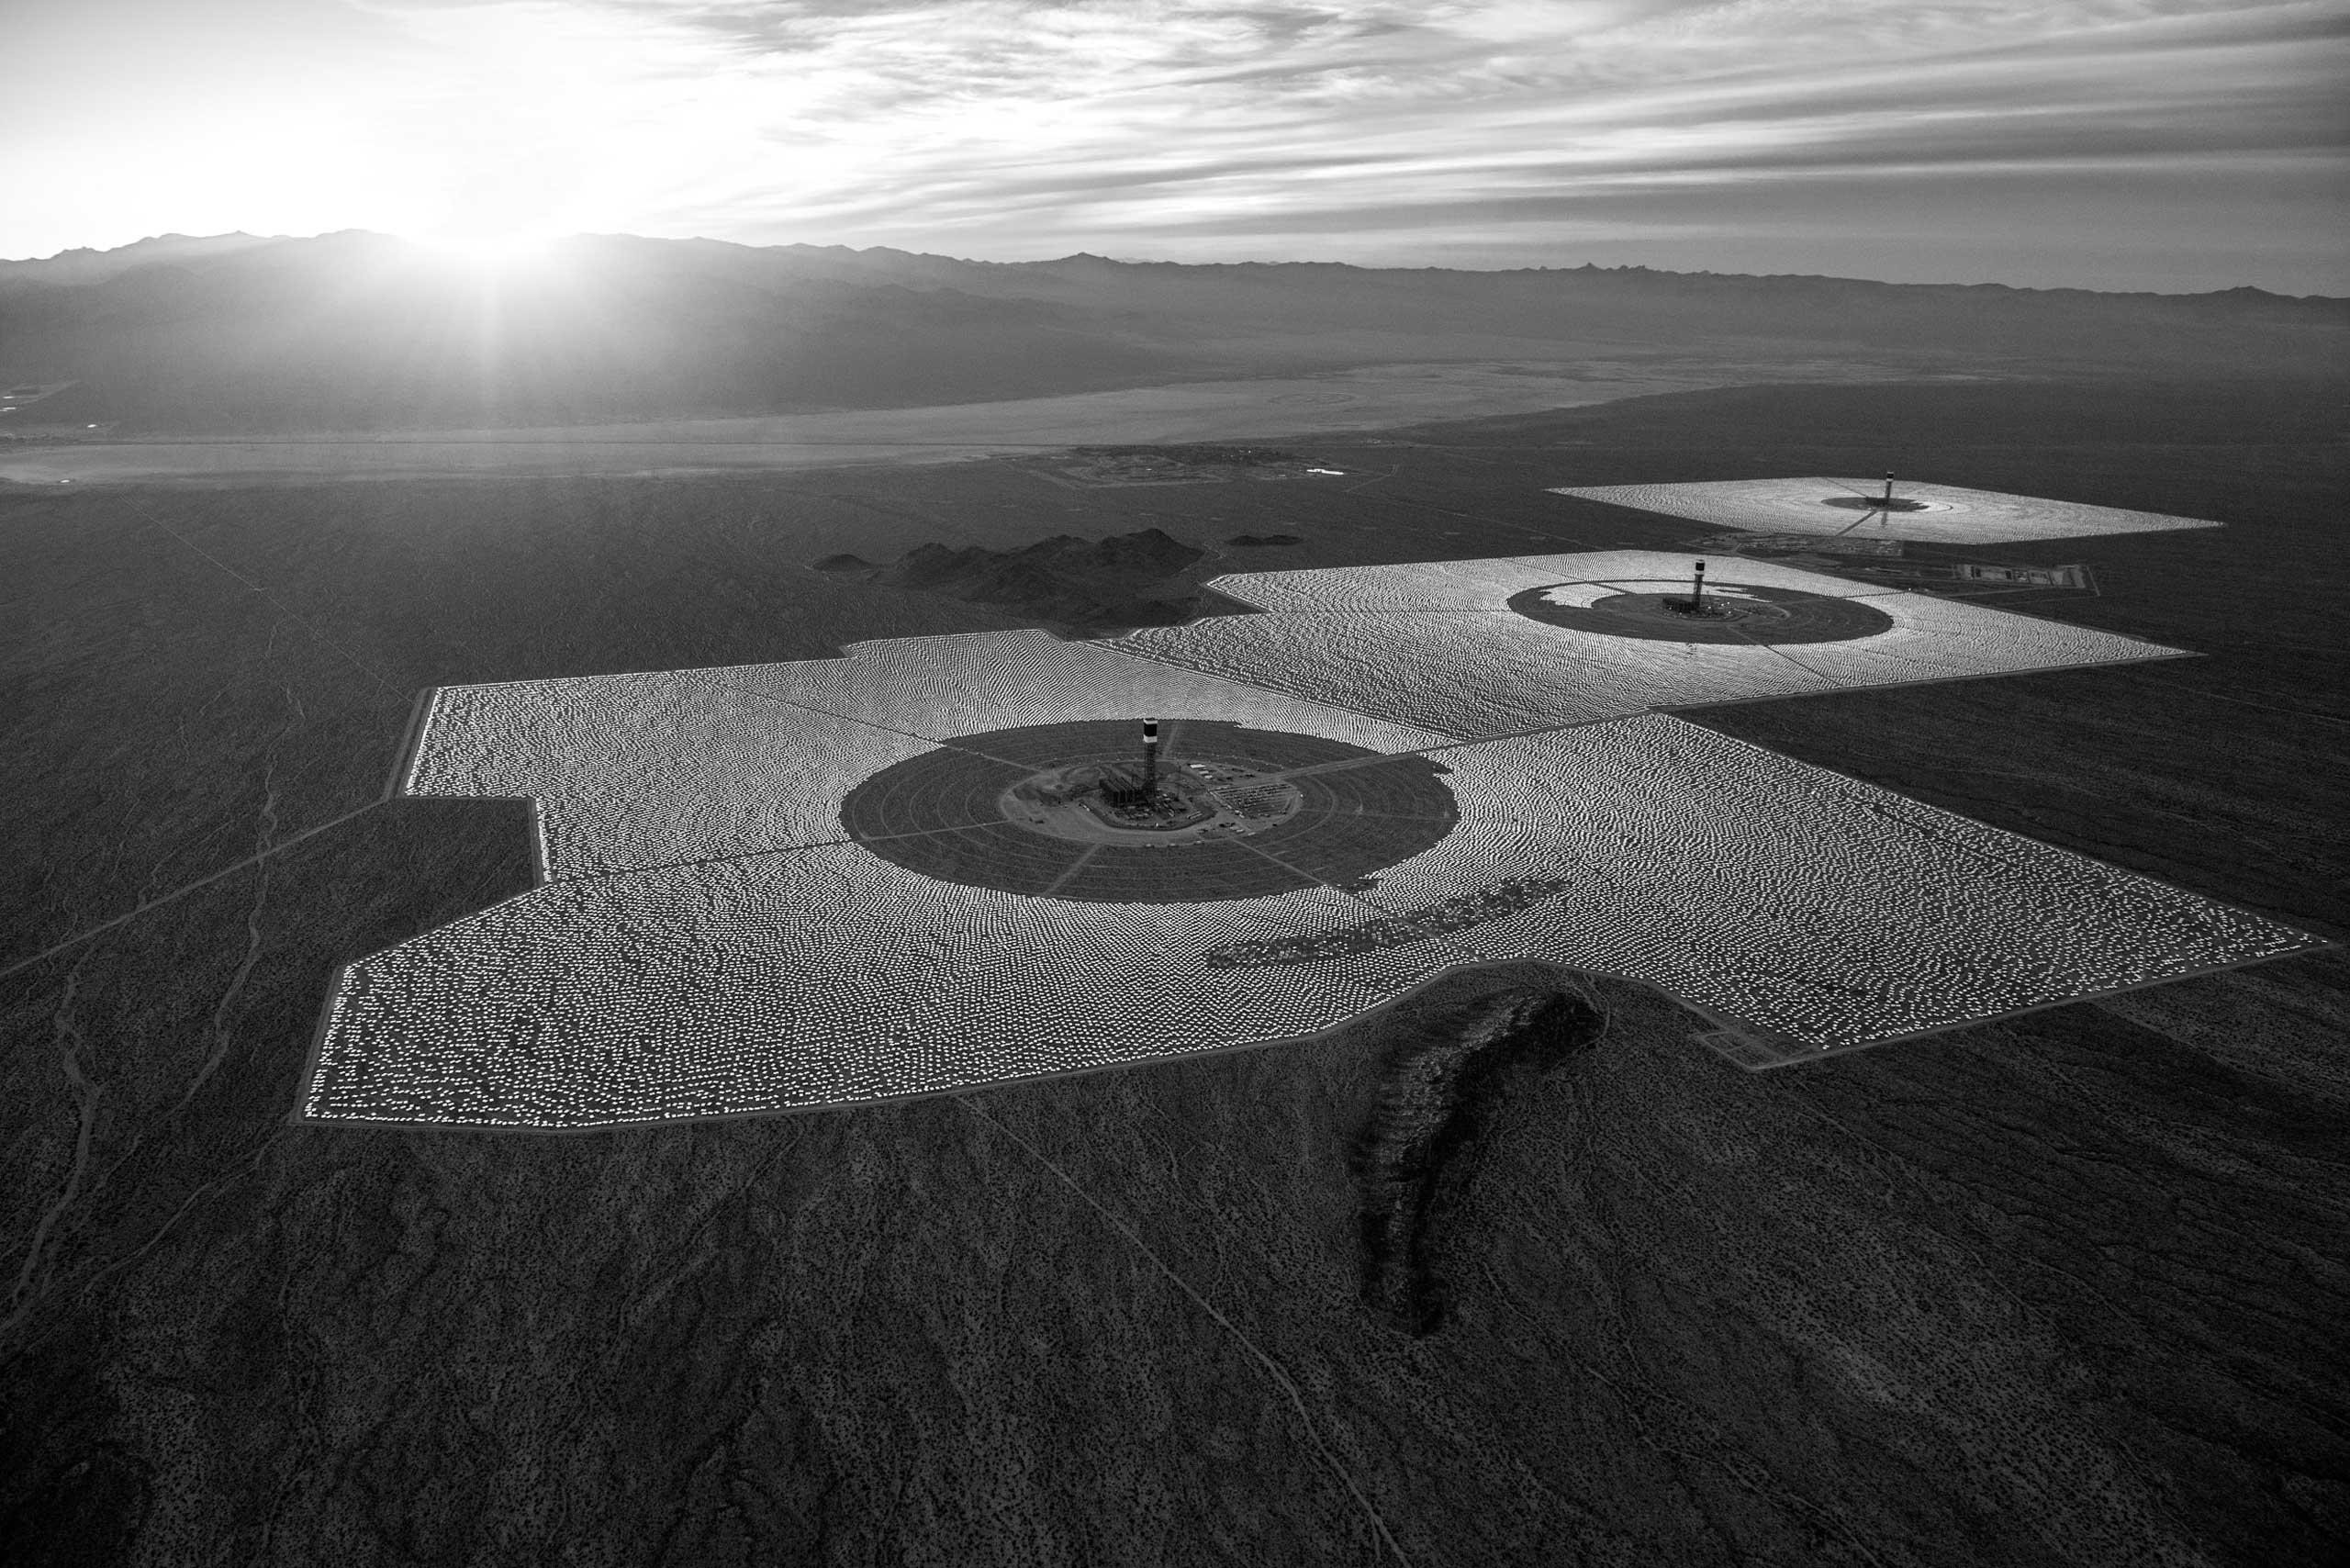 The Ivanpah solar power station in the Mojave Desert, California.